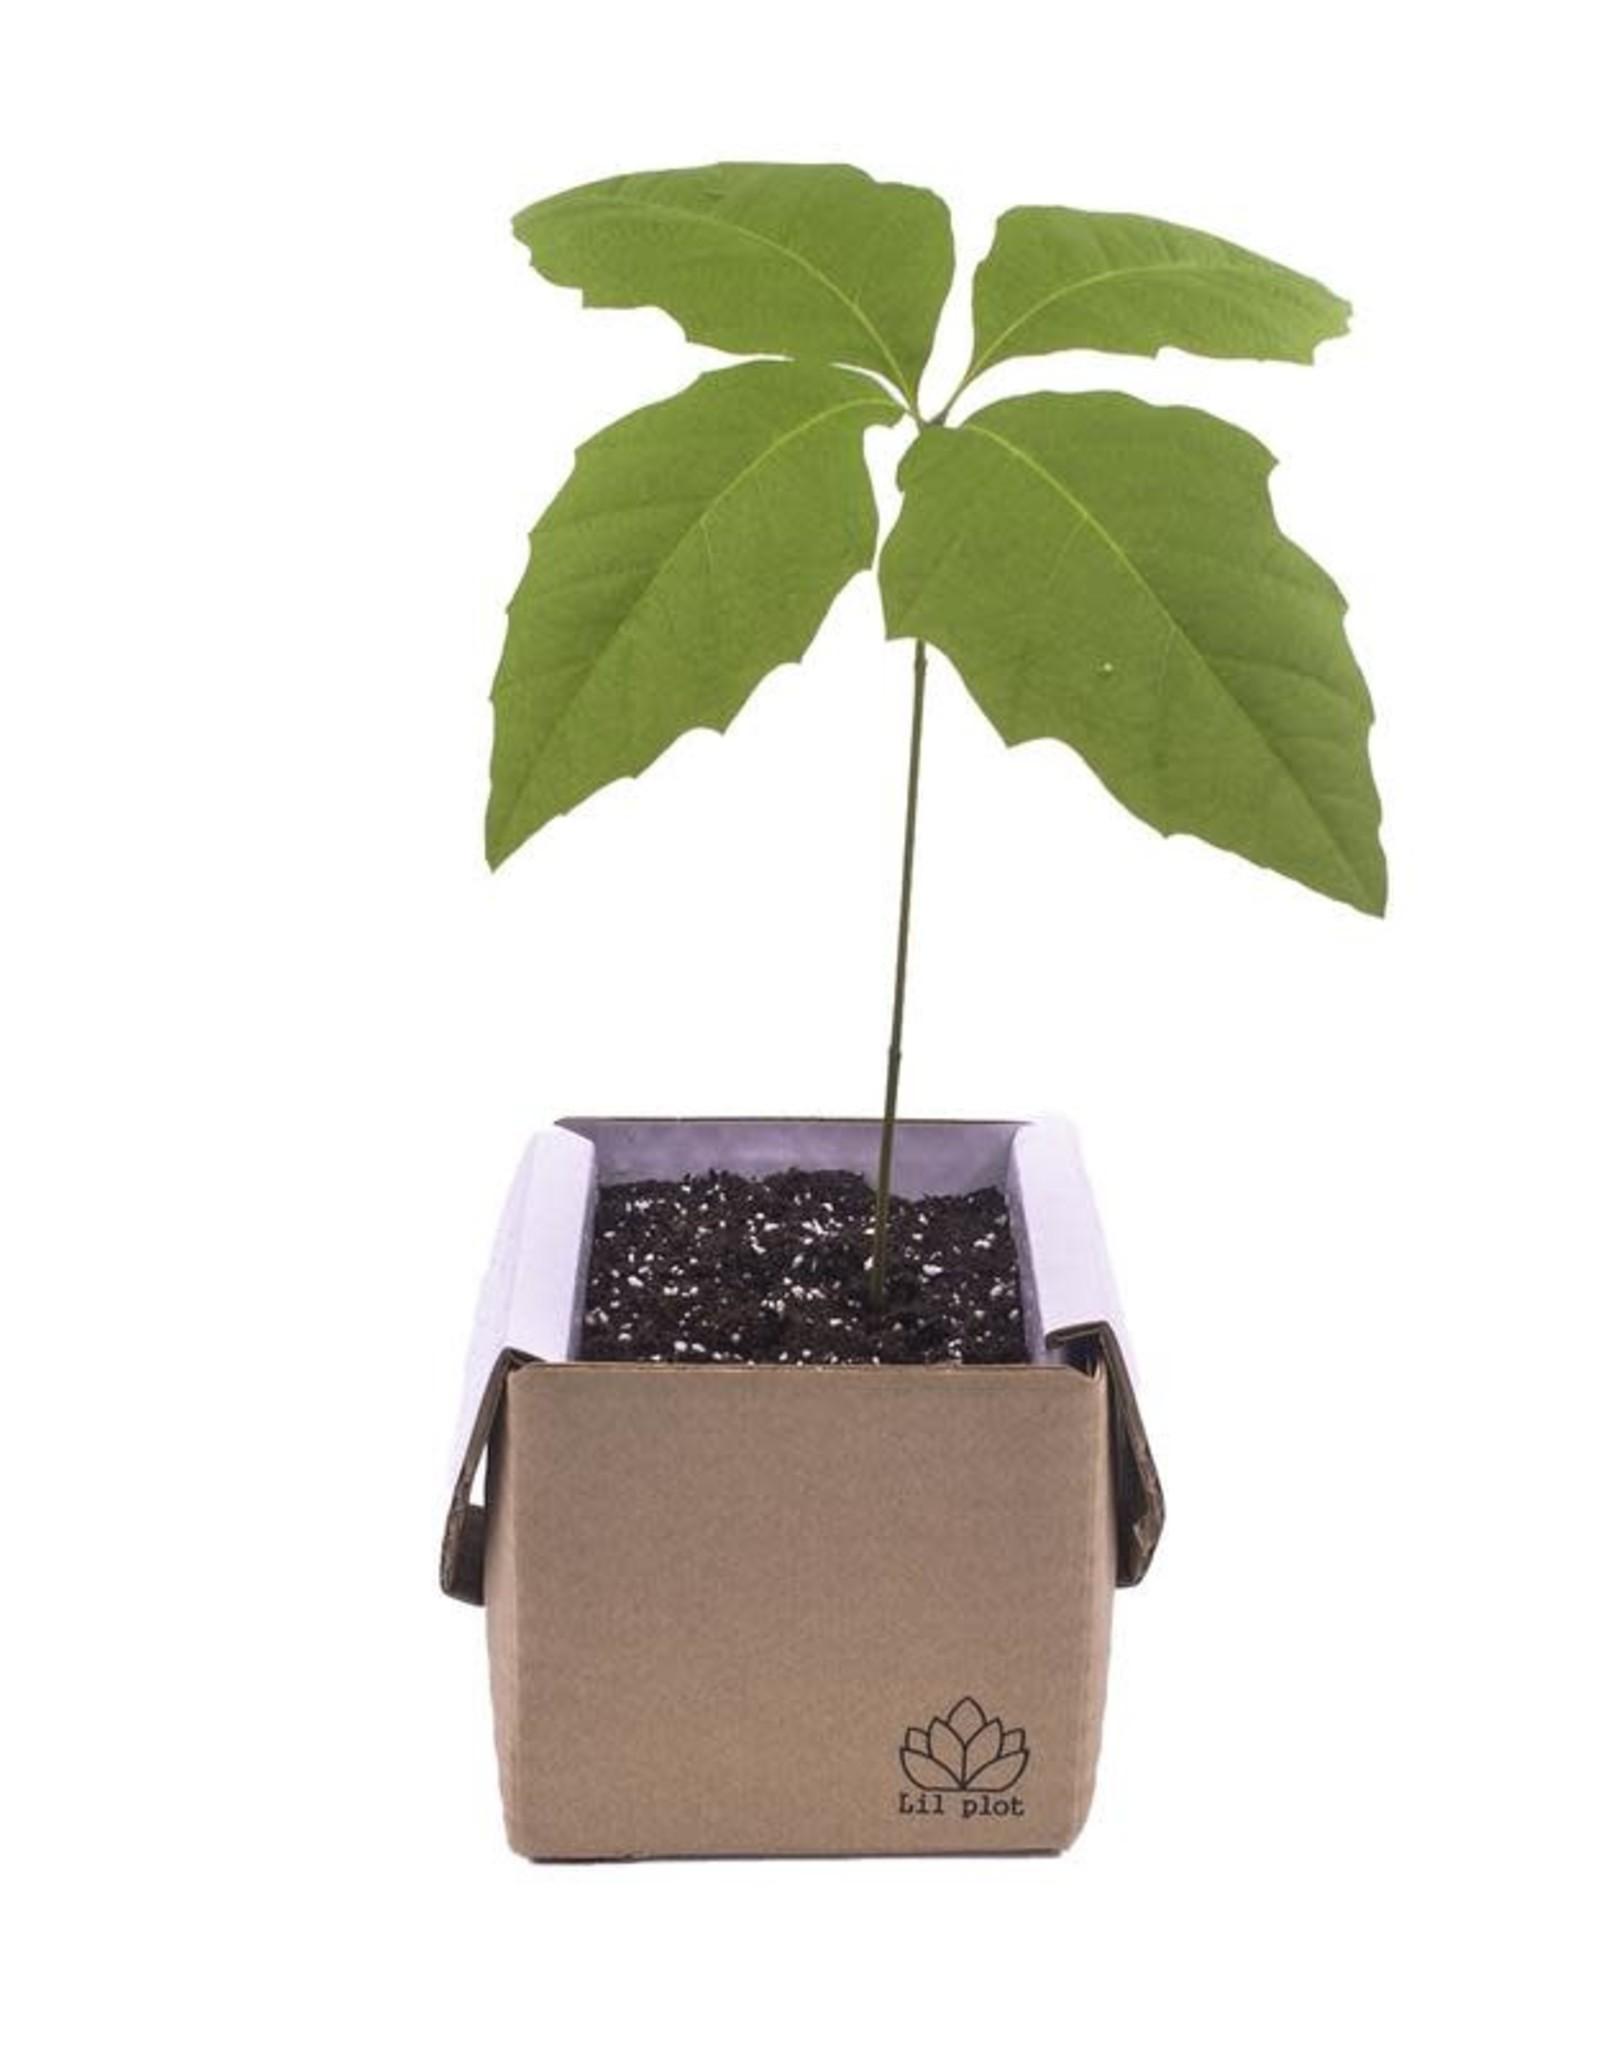 lil plot Grow your own tree Eik